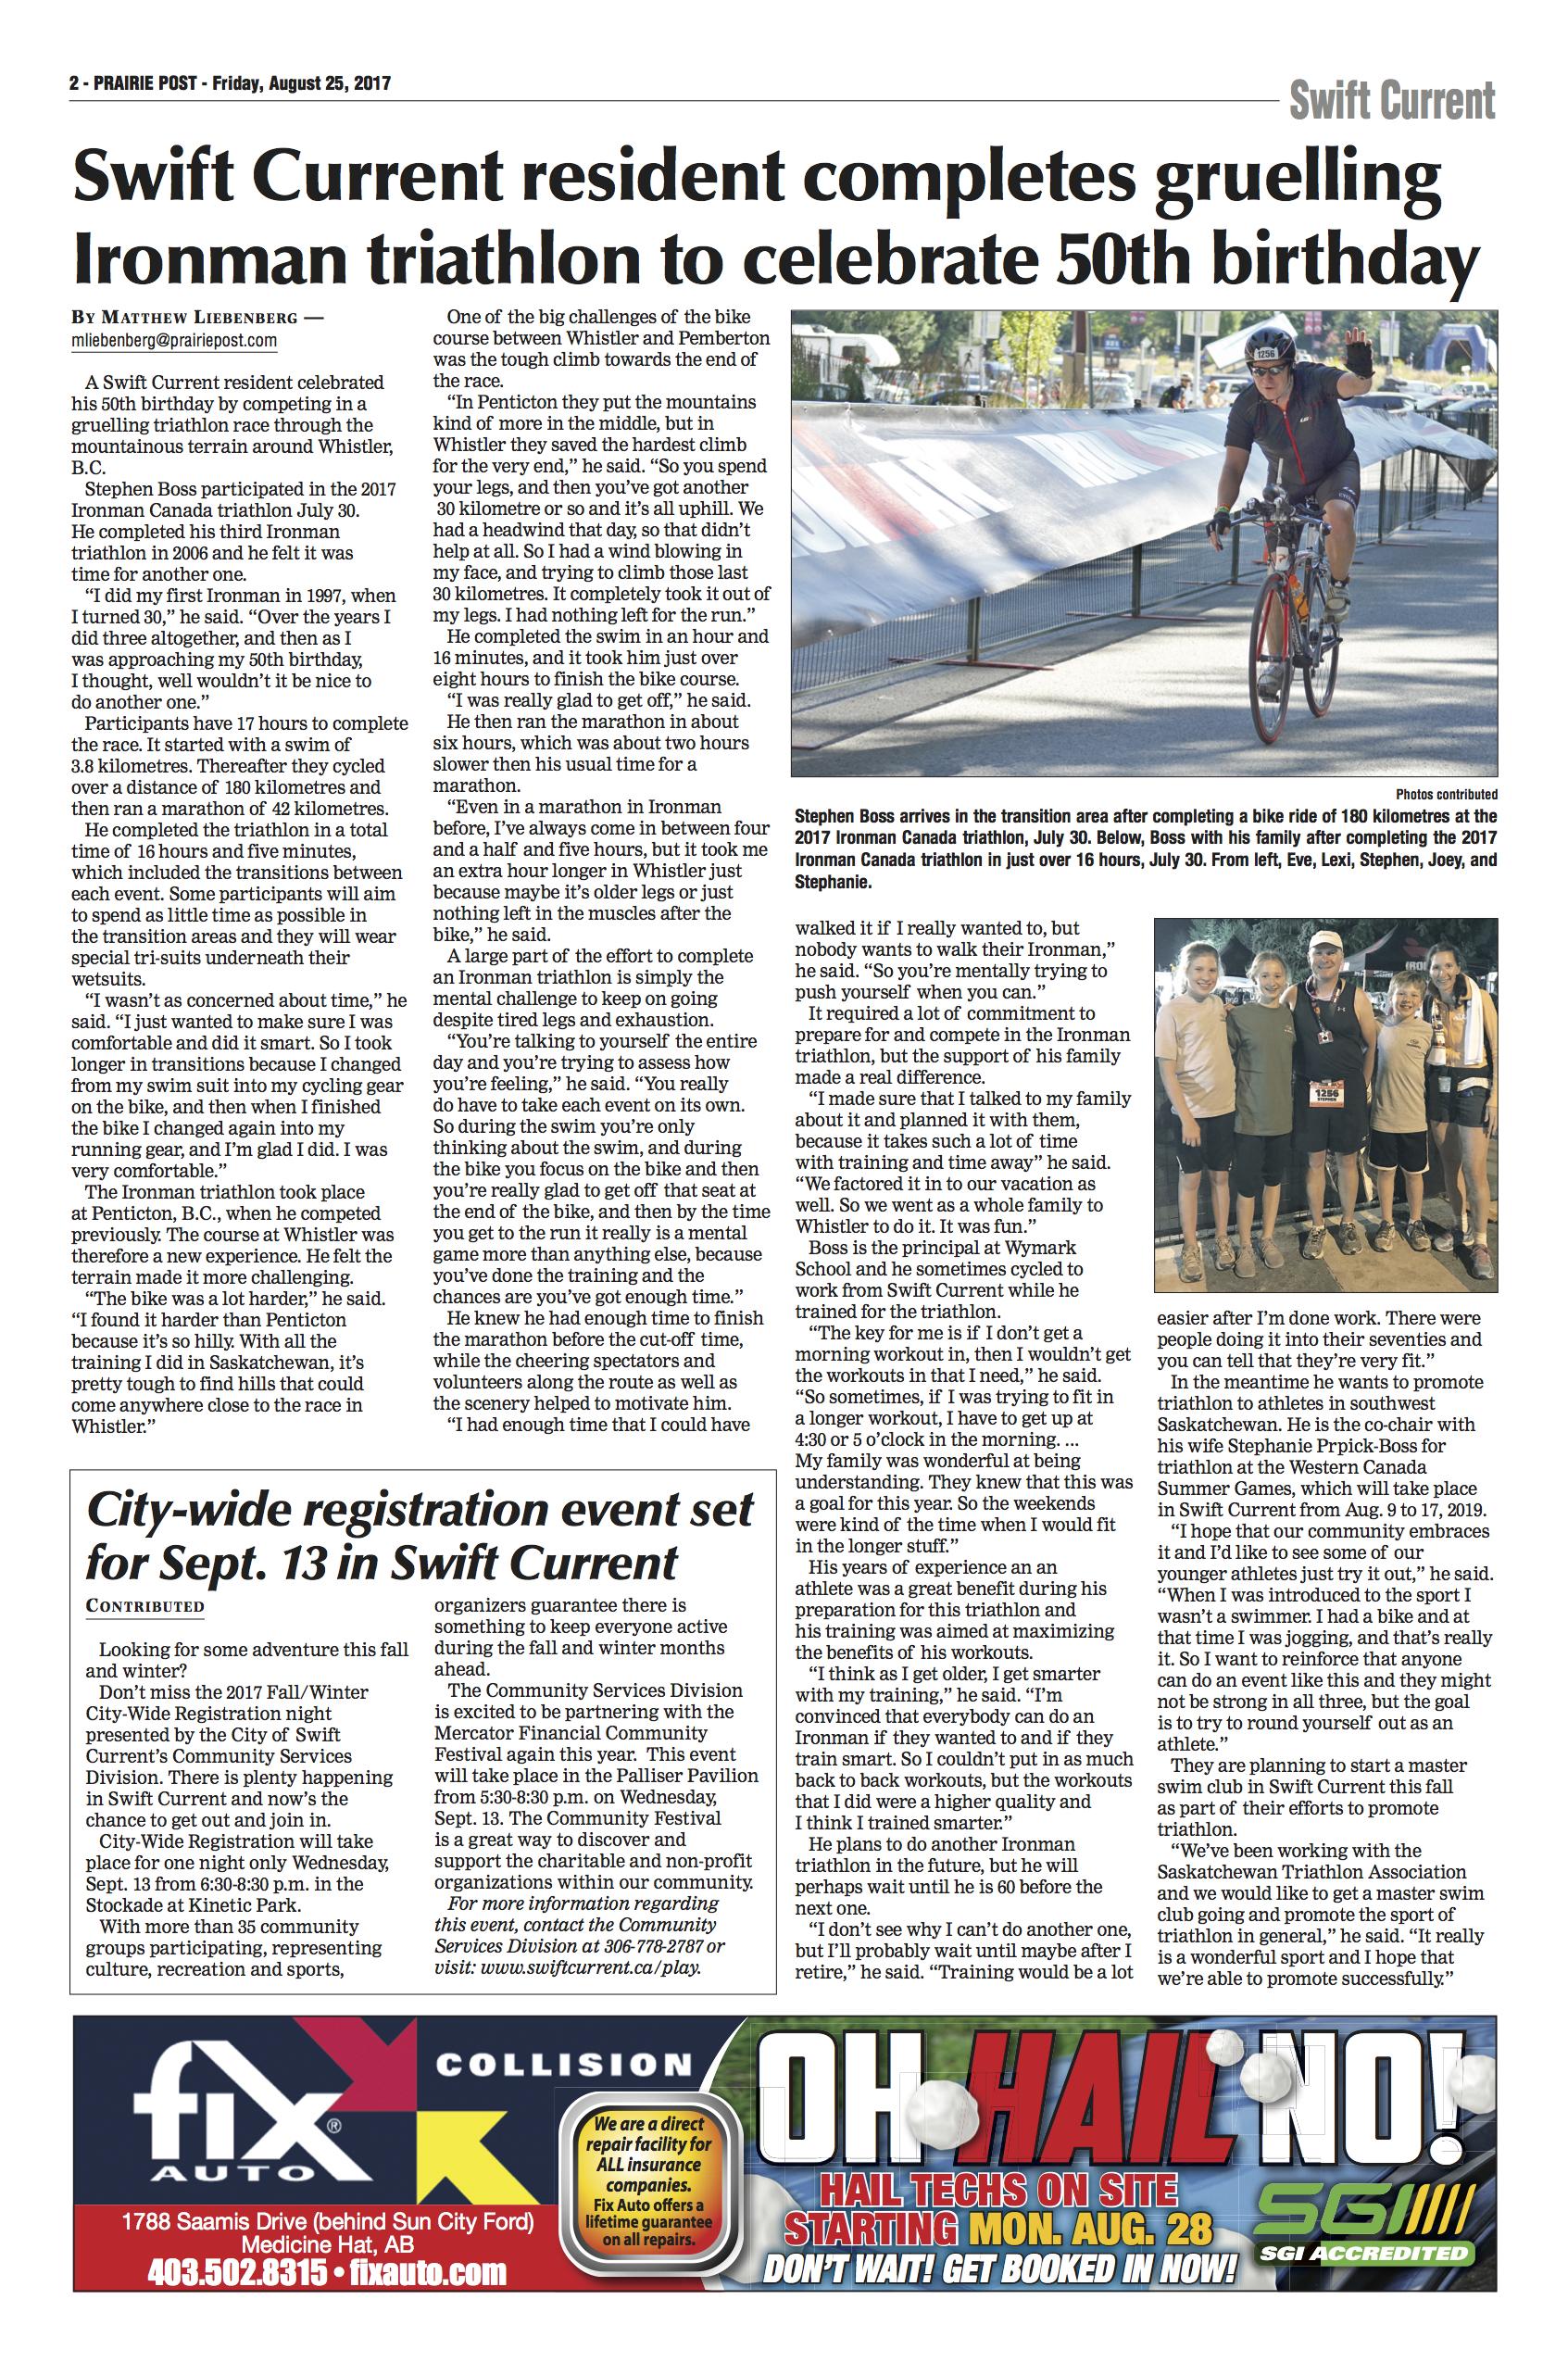 Stephen Boss 2017 Ironman Canada Whistler story in Prairie Post Edition 20170825_D24_02.jpg